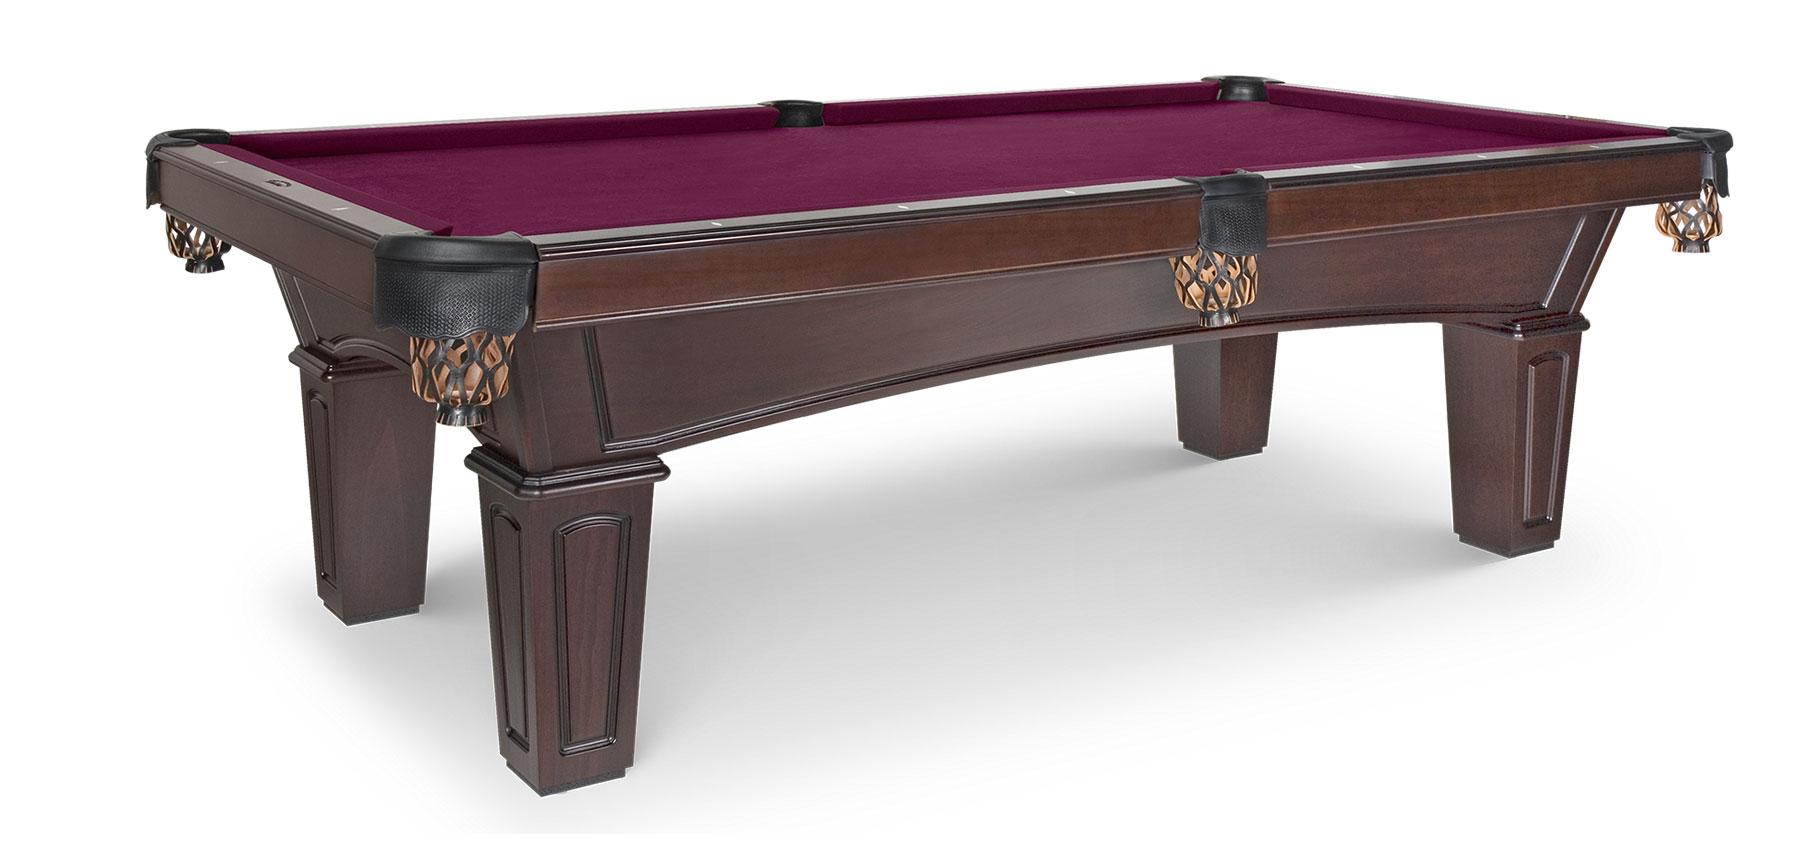 Absolute Billiard ServicesOlhausen Pool Tables - Absolute Billiard ...